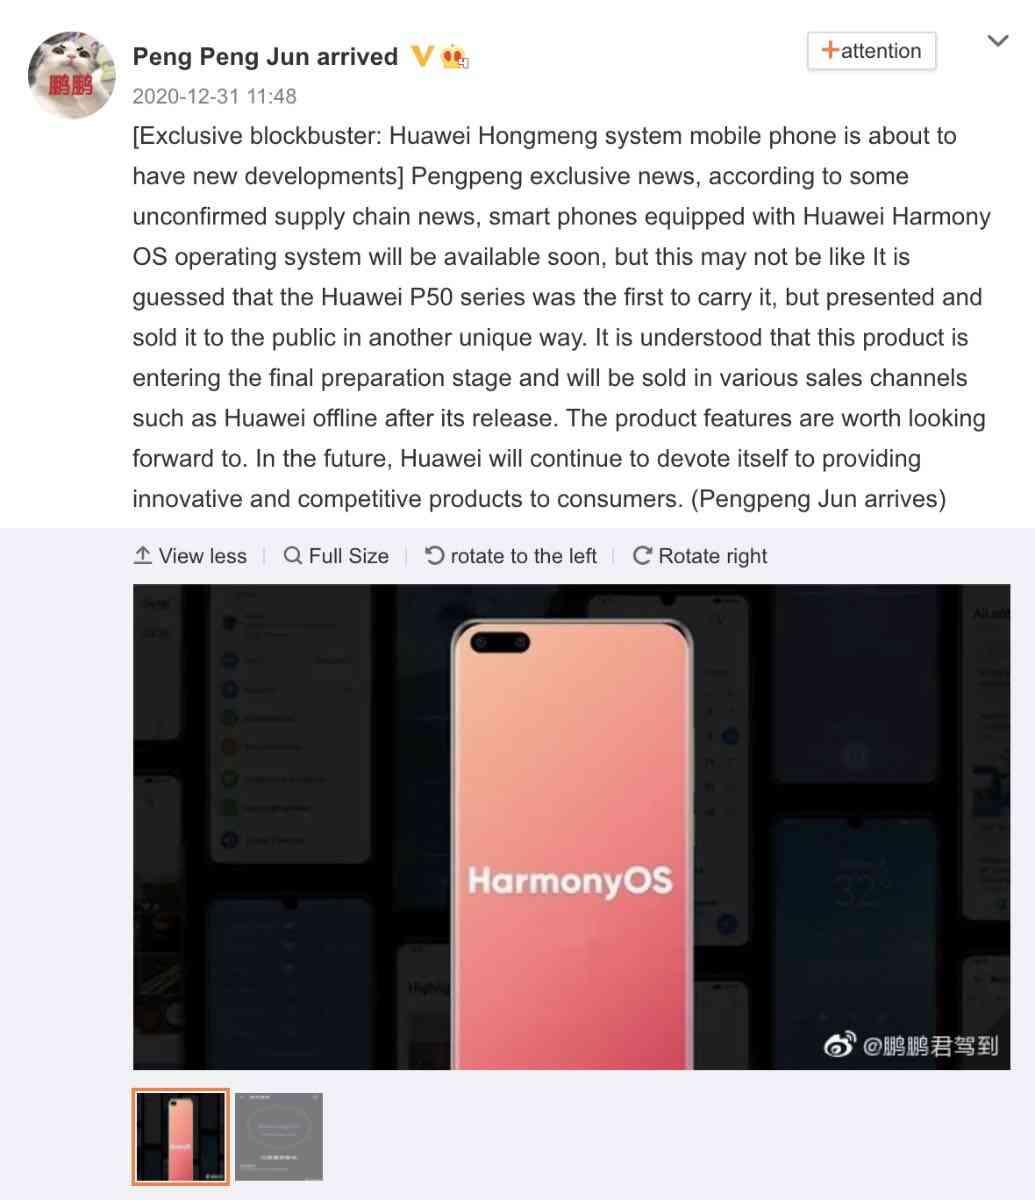 huawei p50 harmonyos 2